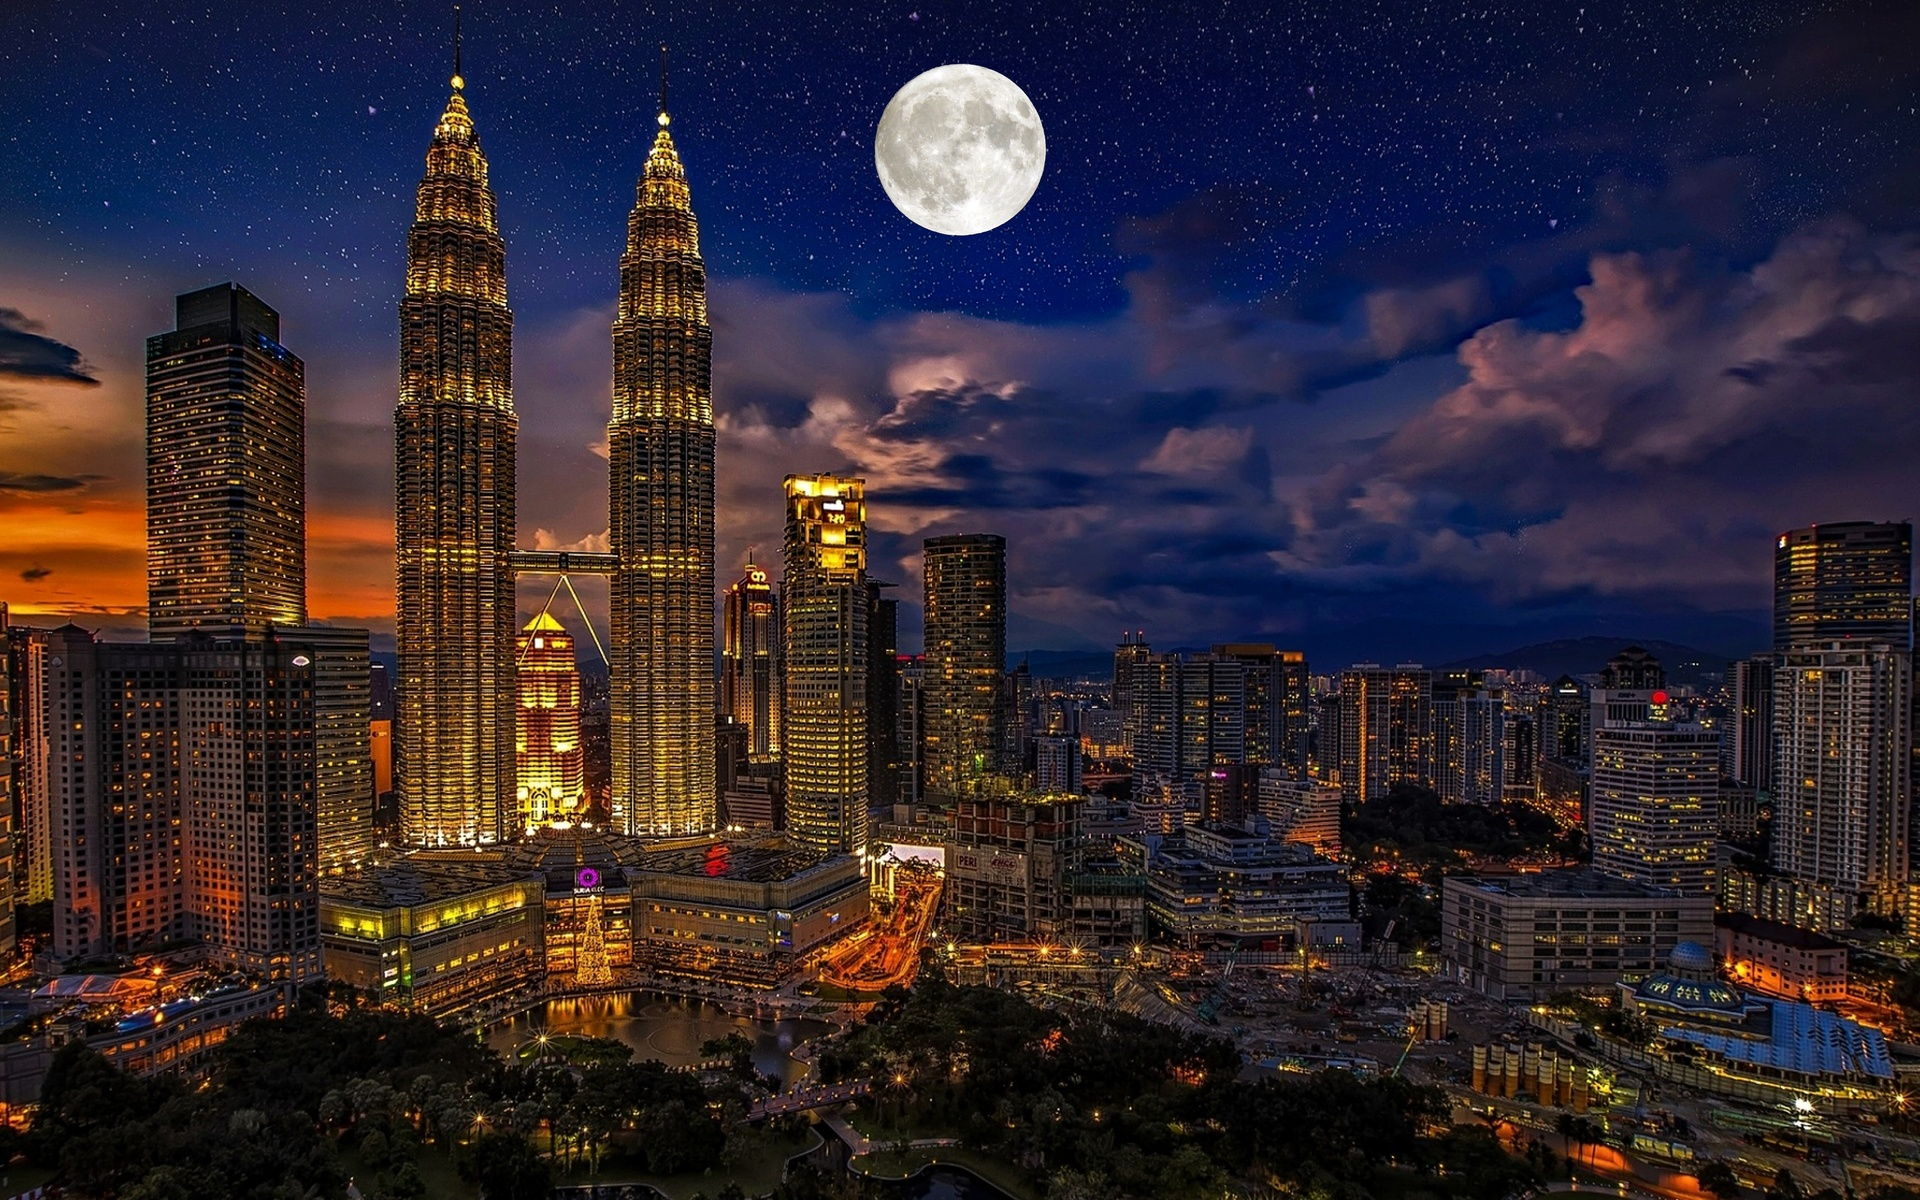 ночь, луна, город, пейзаж, куала-лумпур, малайзия